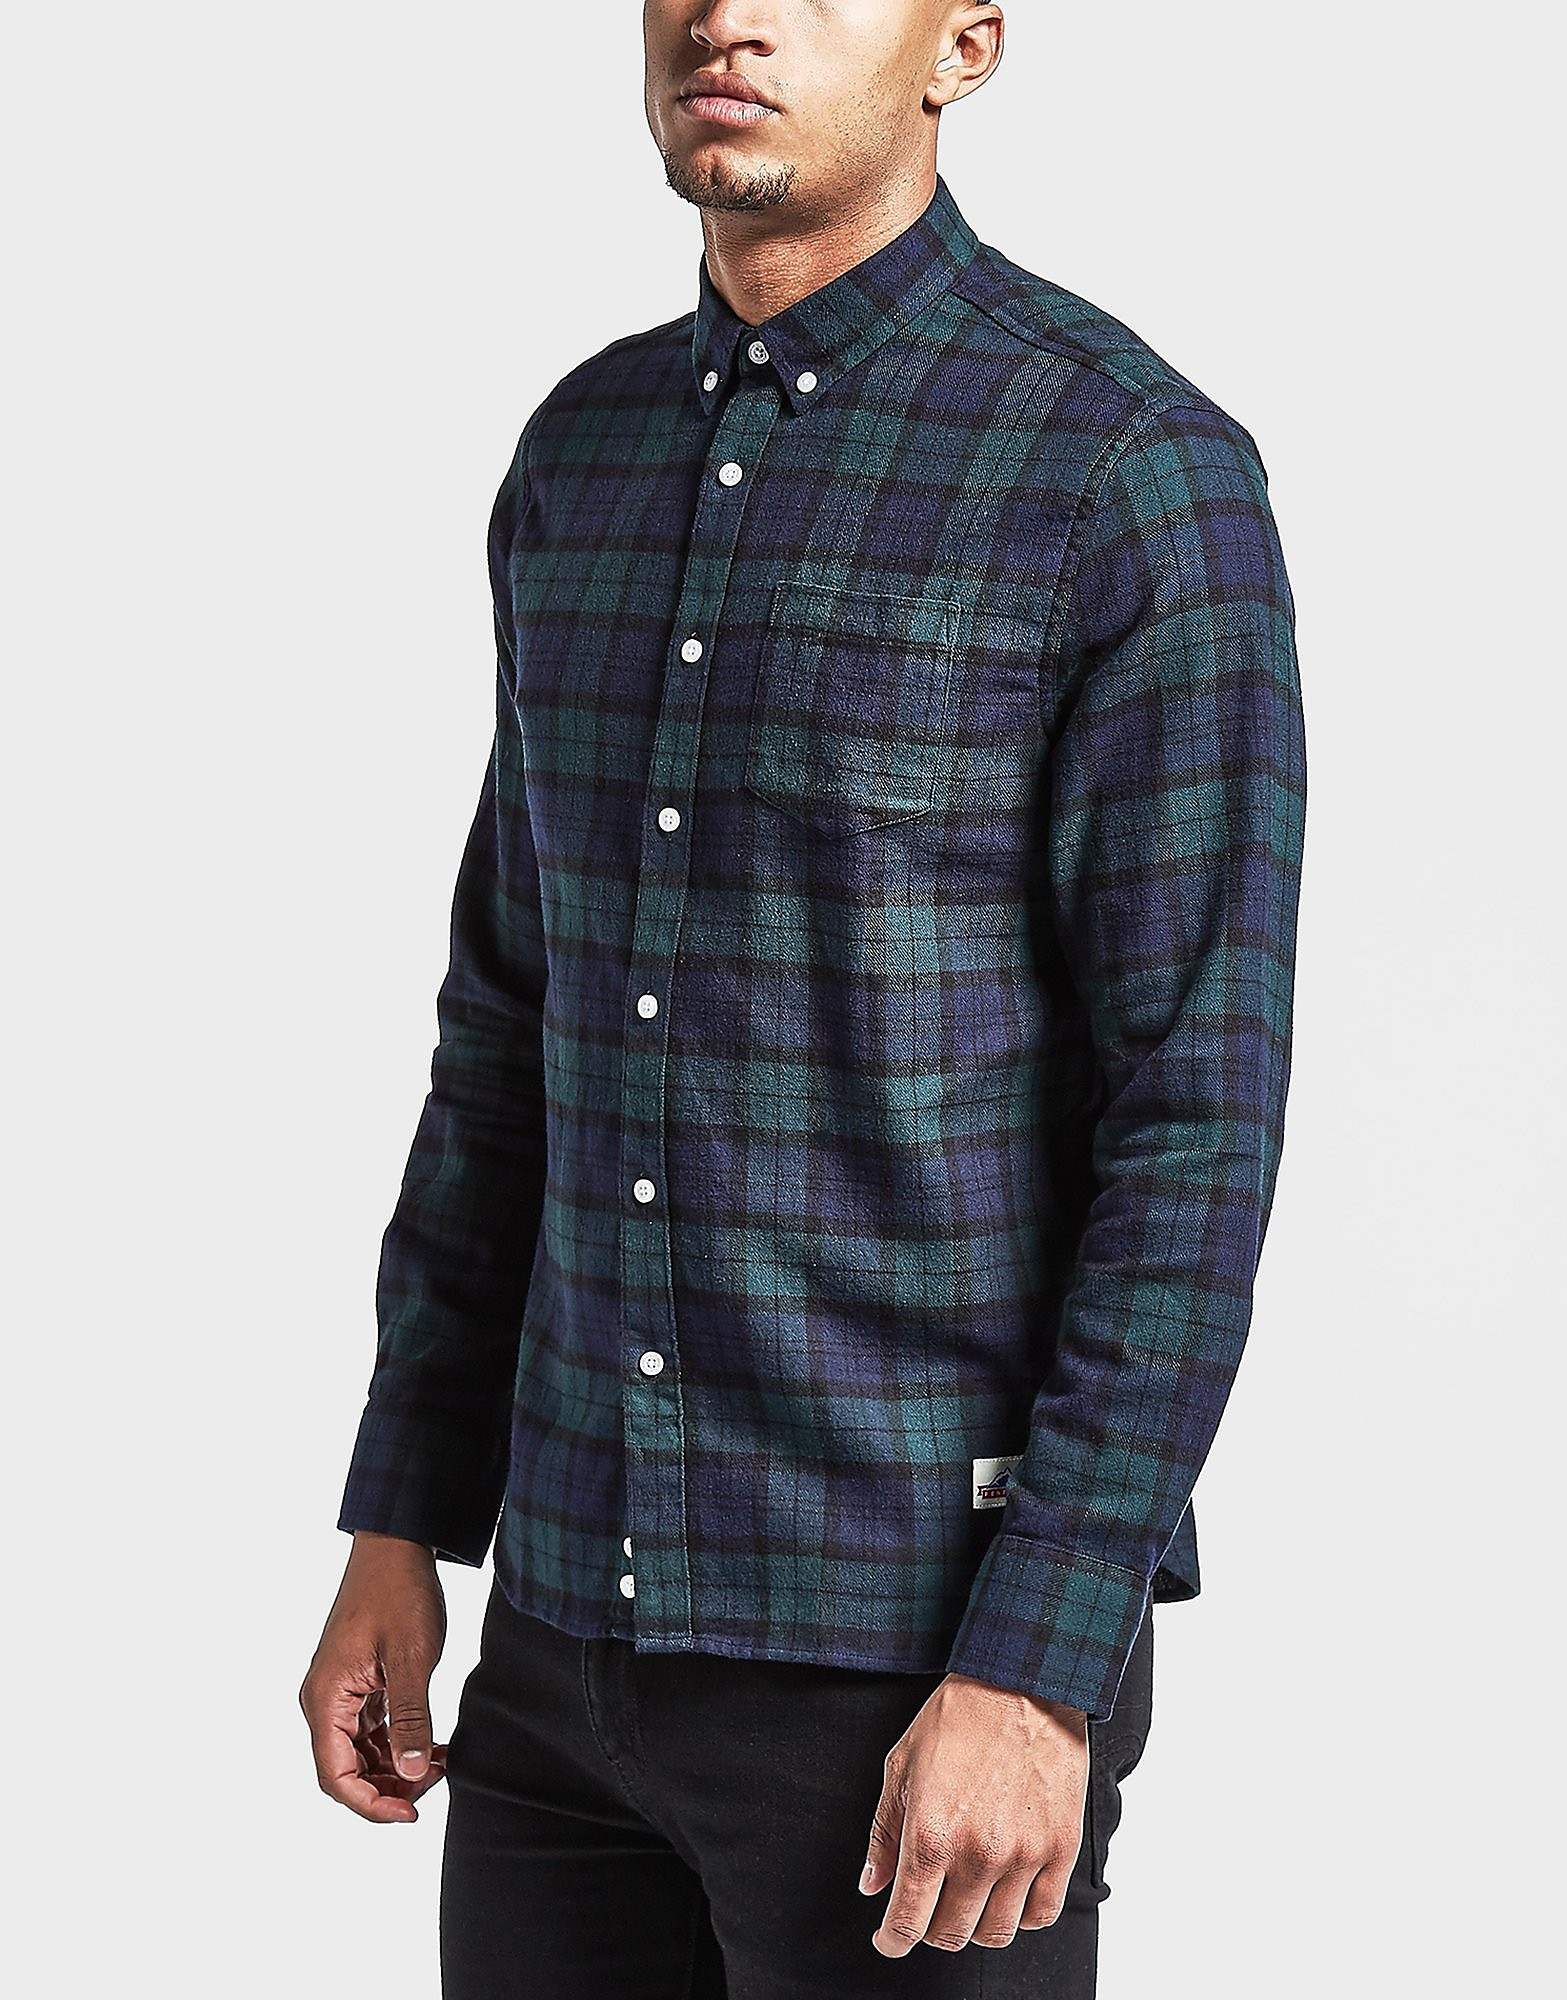 Penfield Young Blackwatch Long Sleeve Shirt